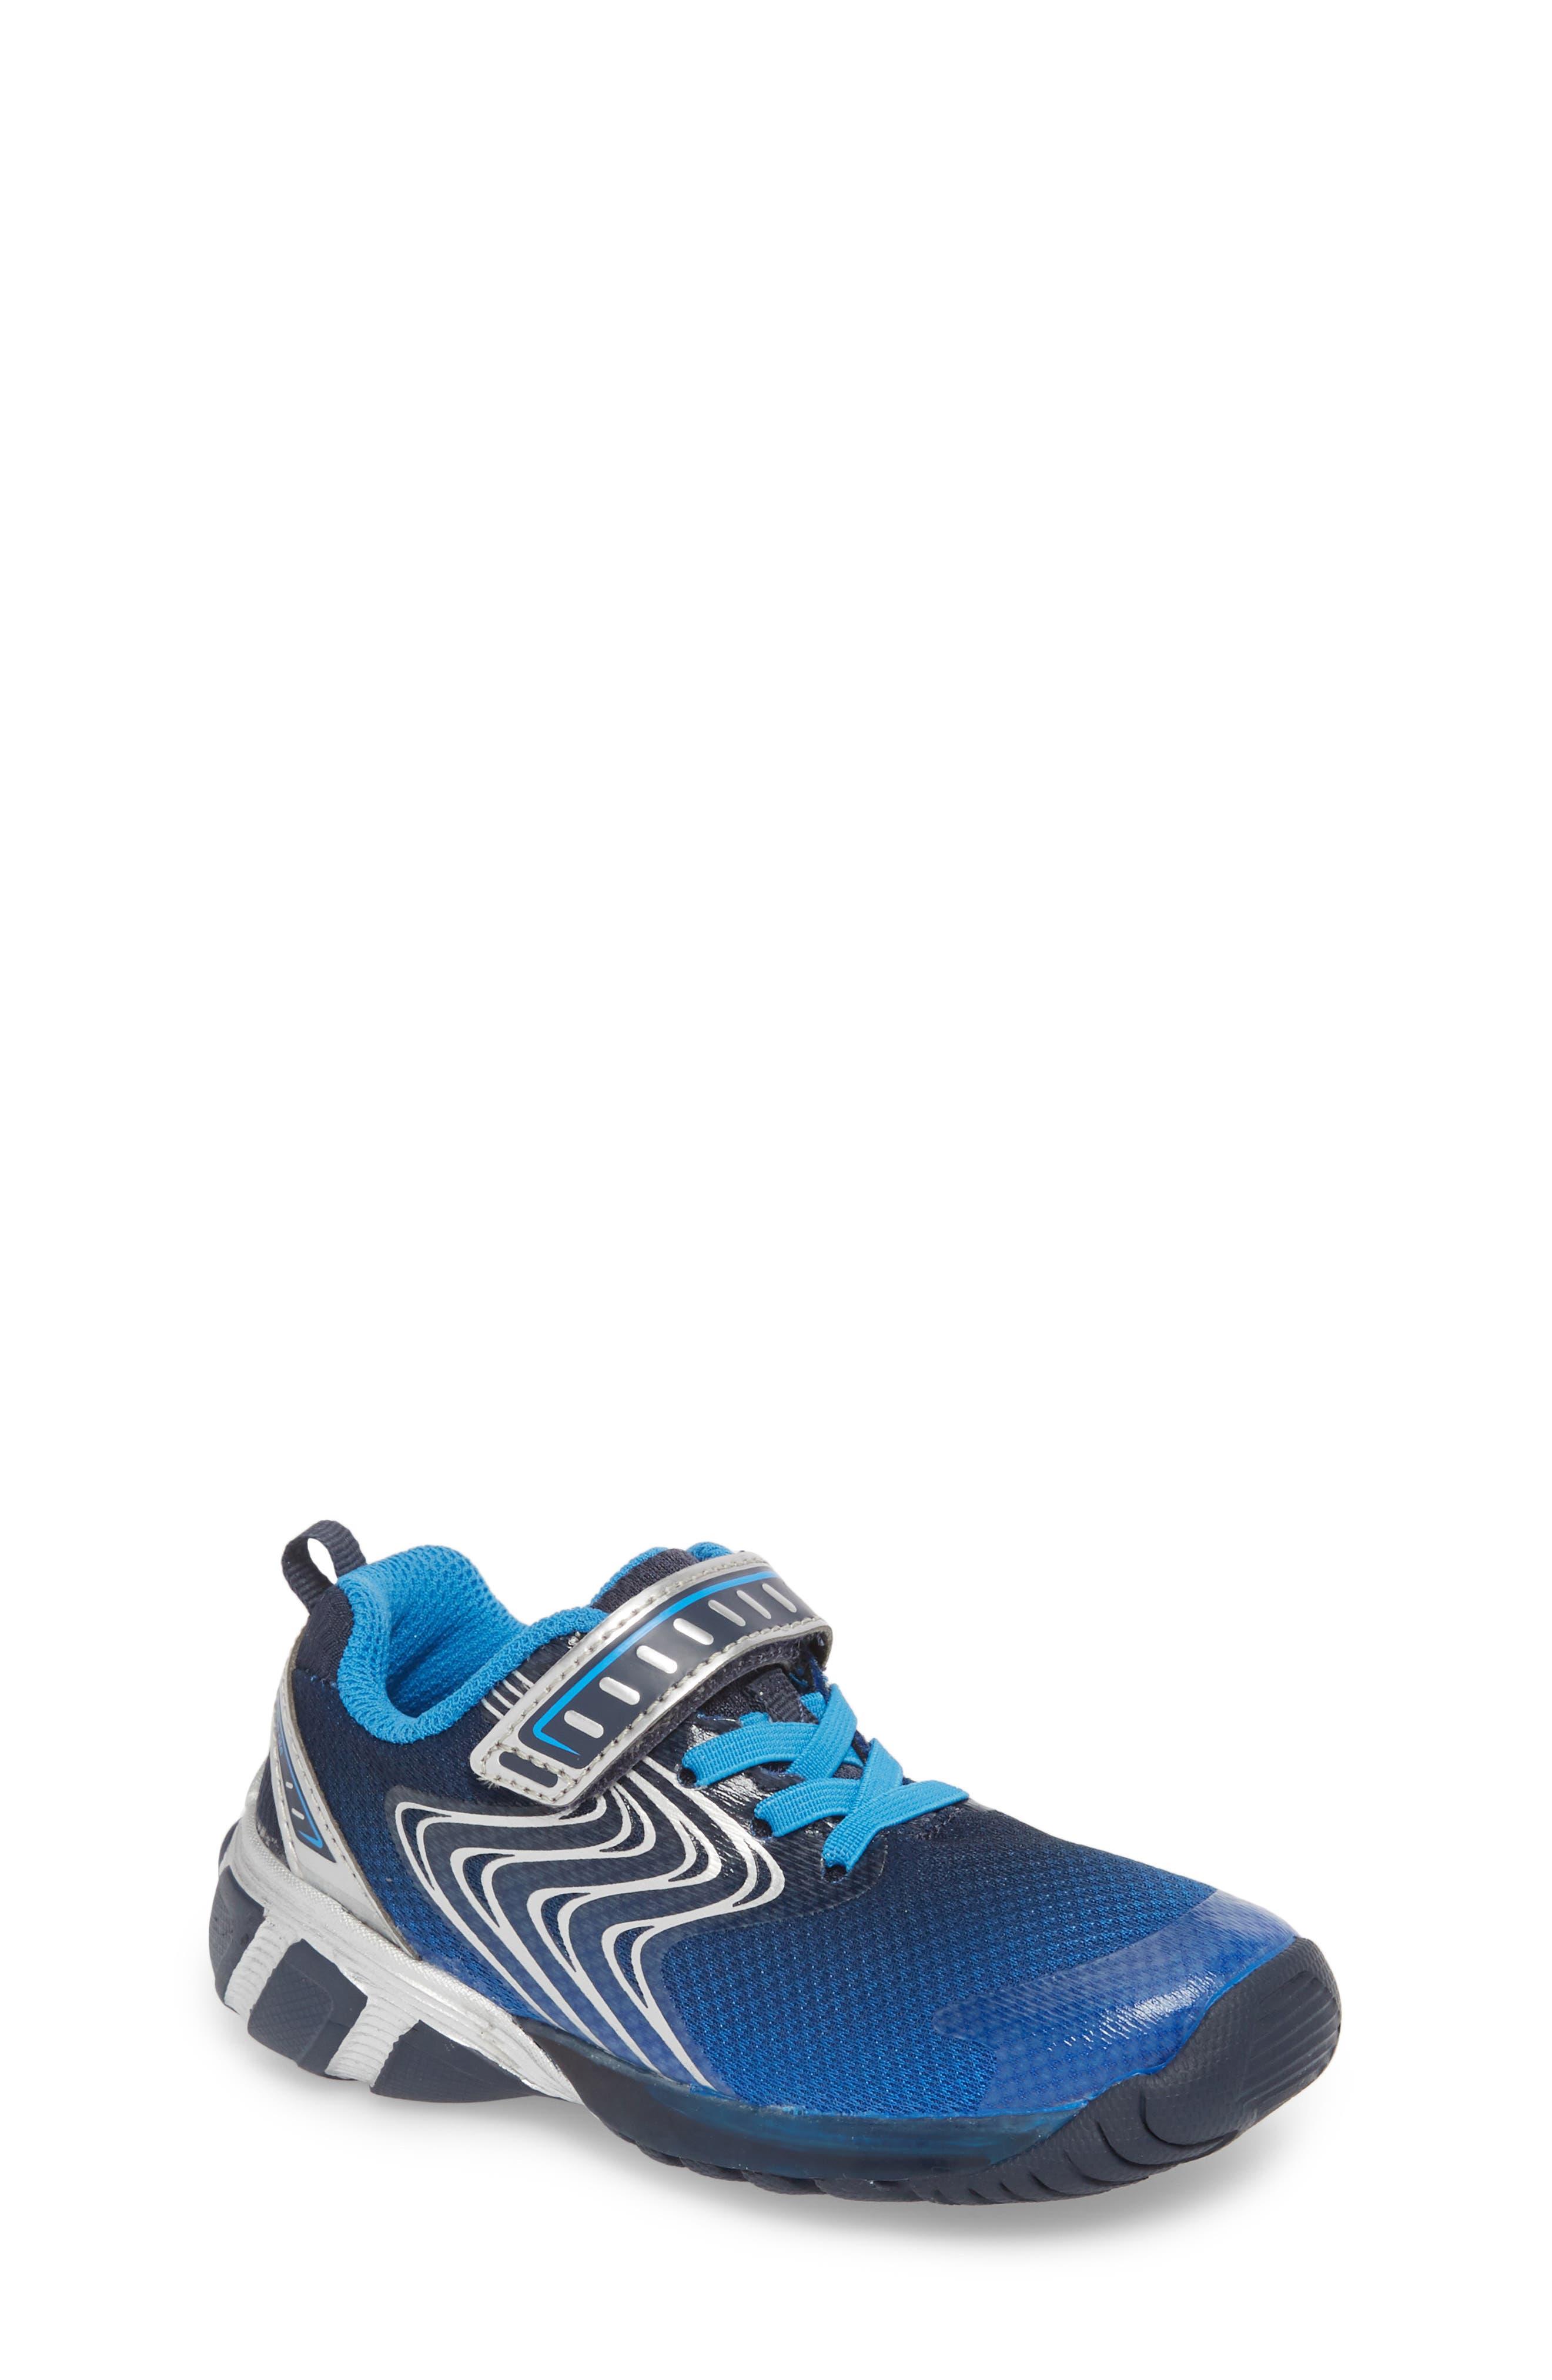 Alternate Image 1 Selected - Stride Rite Lights Lux Light-Up Sneaker (Walker &Toddler)